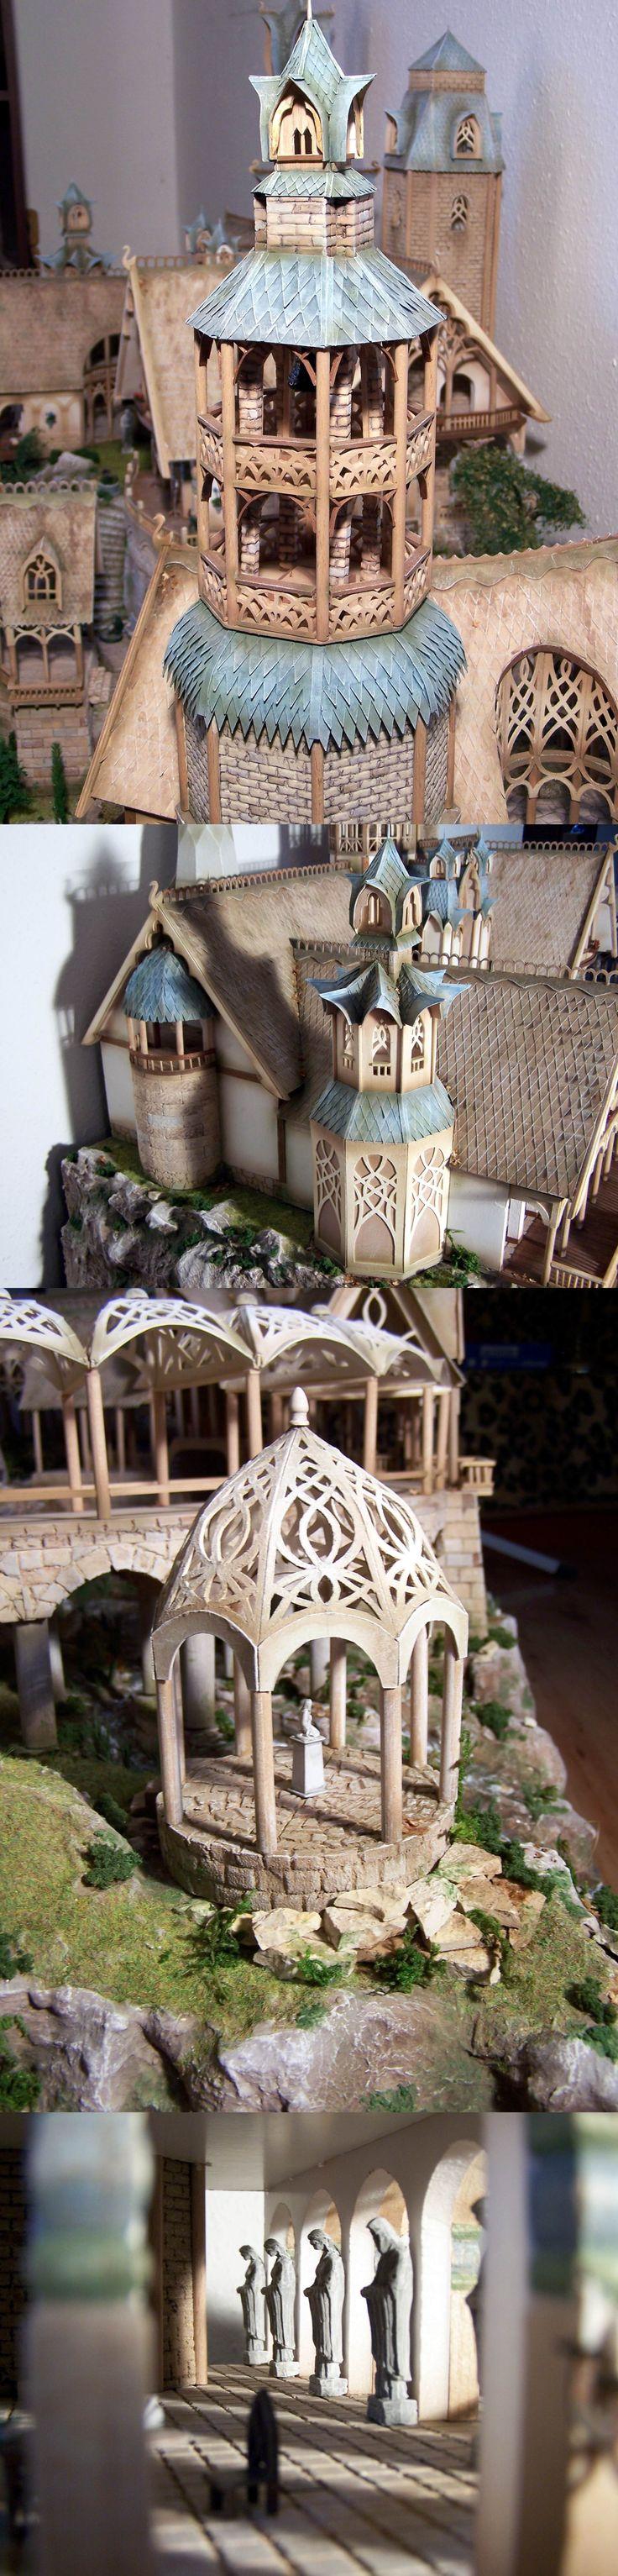 Rivendell. House of Elrond